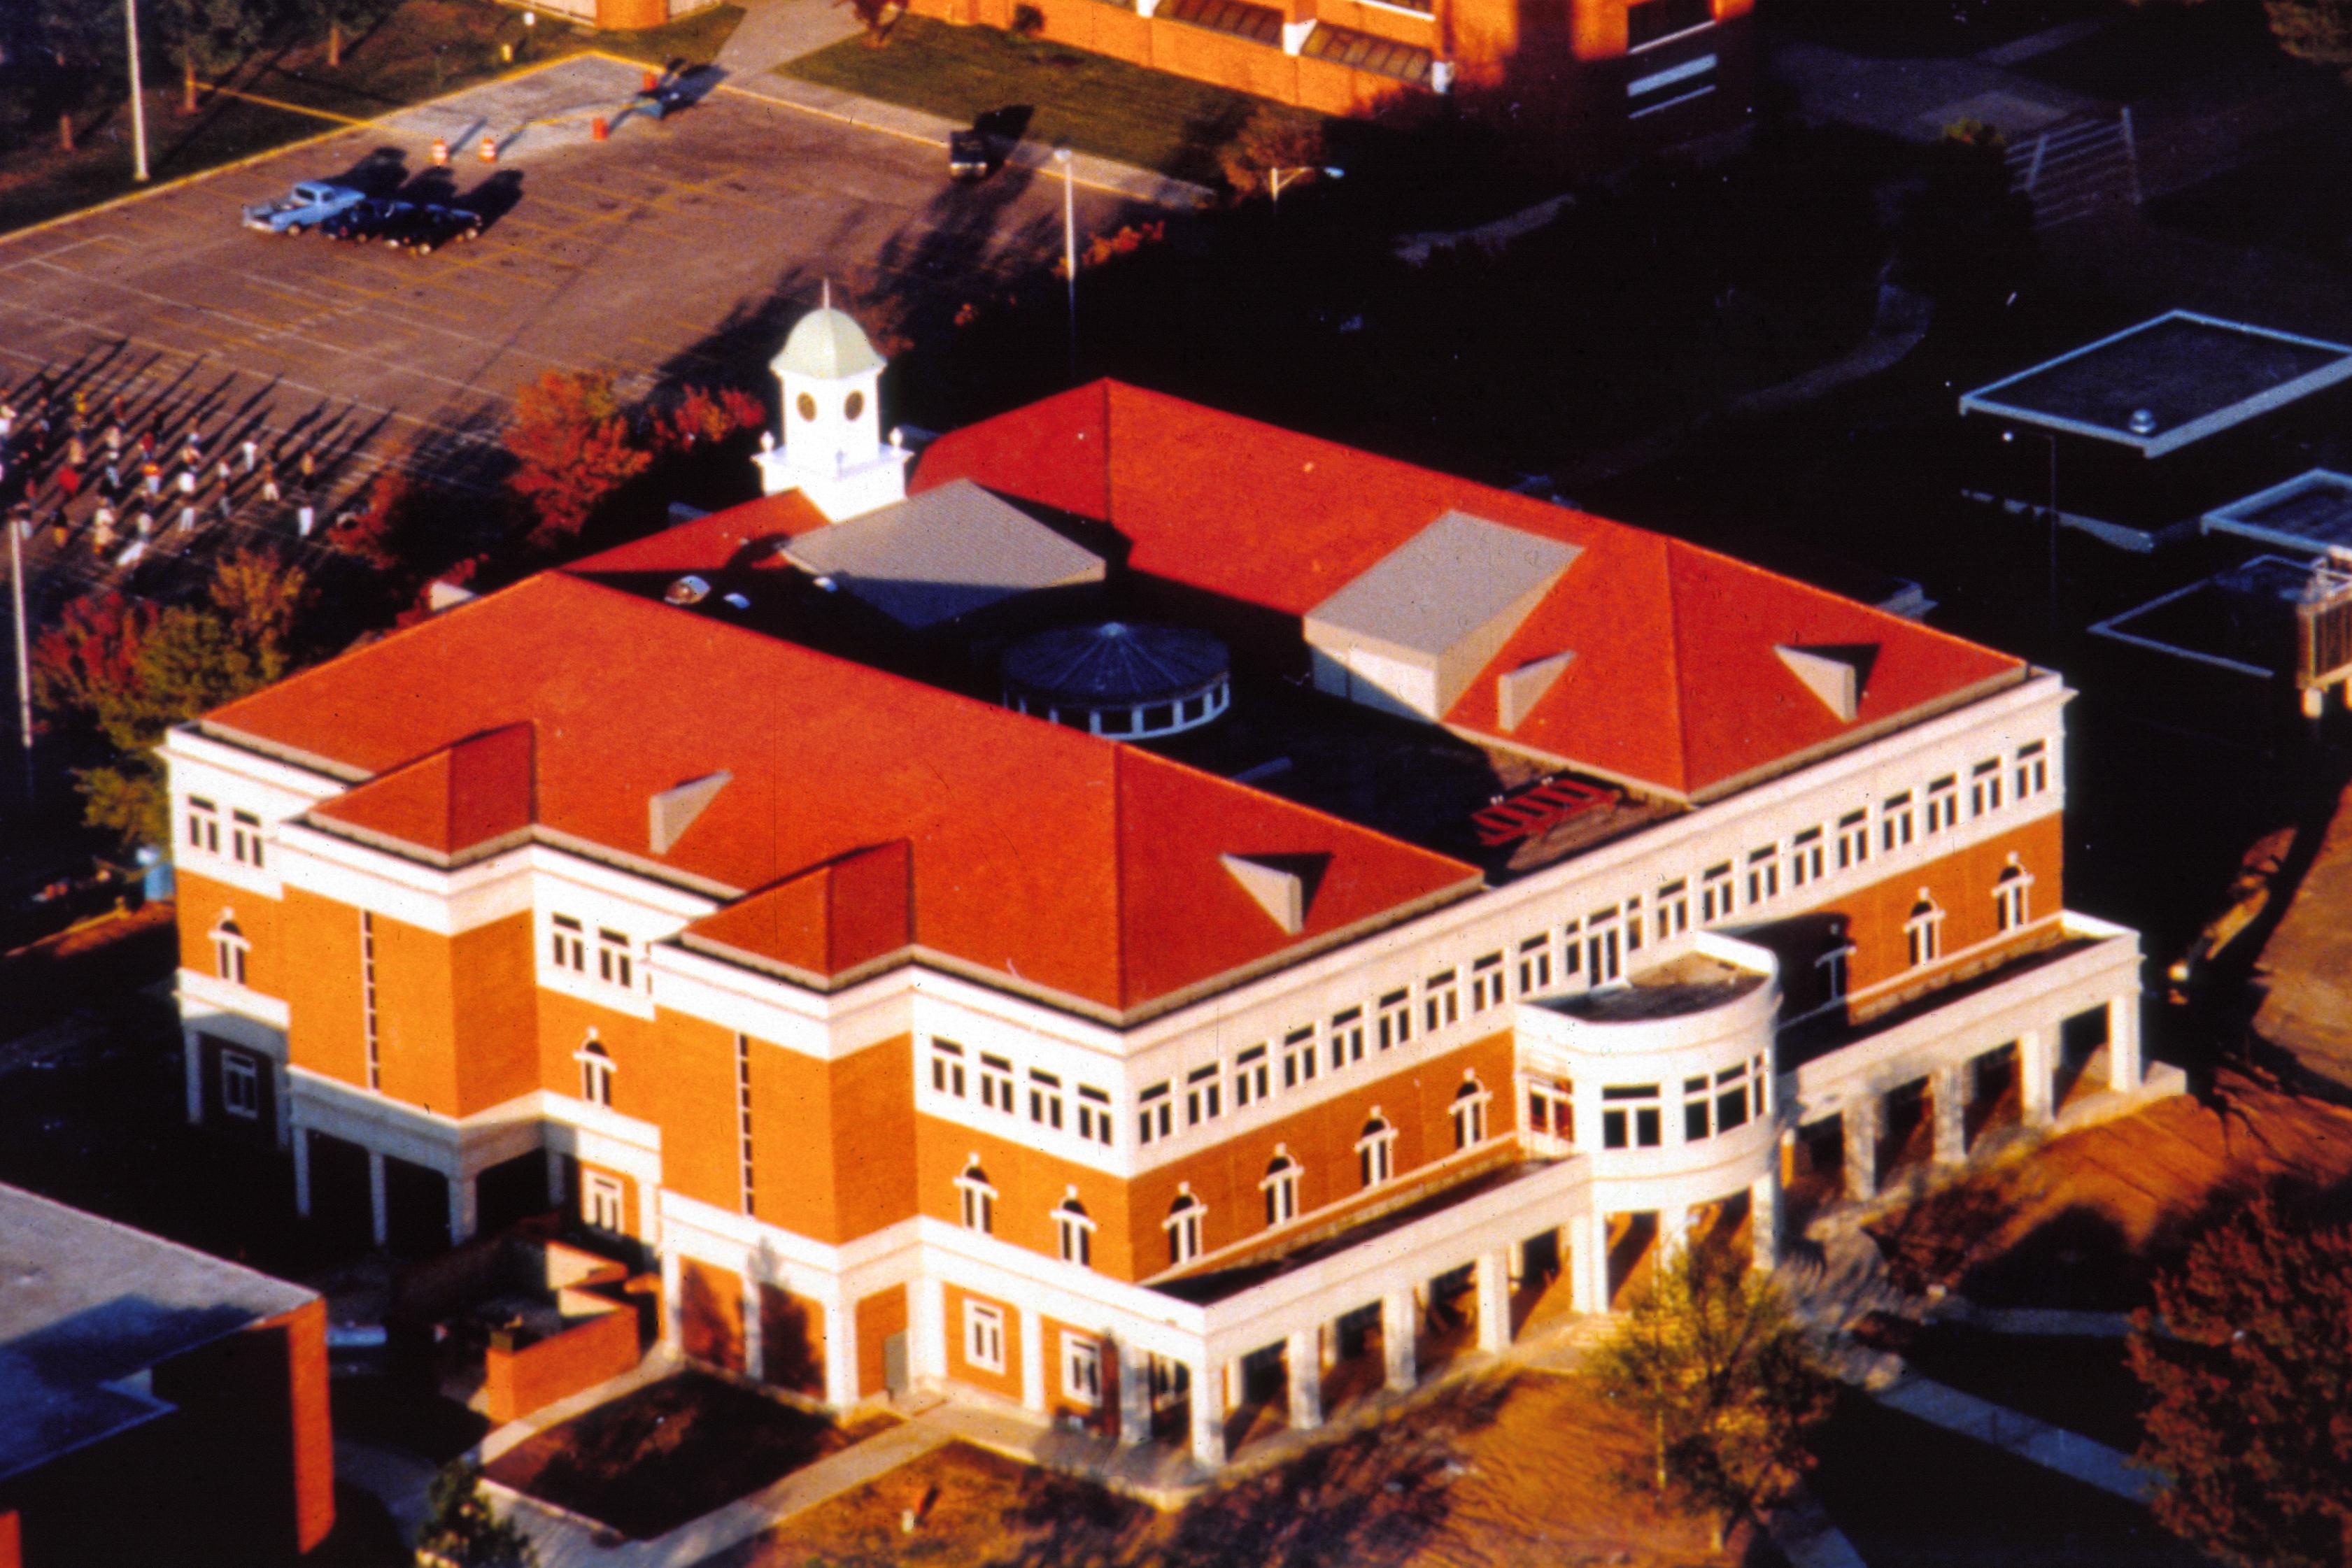 Ross Pendergraft Library and Technology Center (RPL)